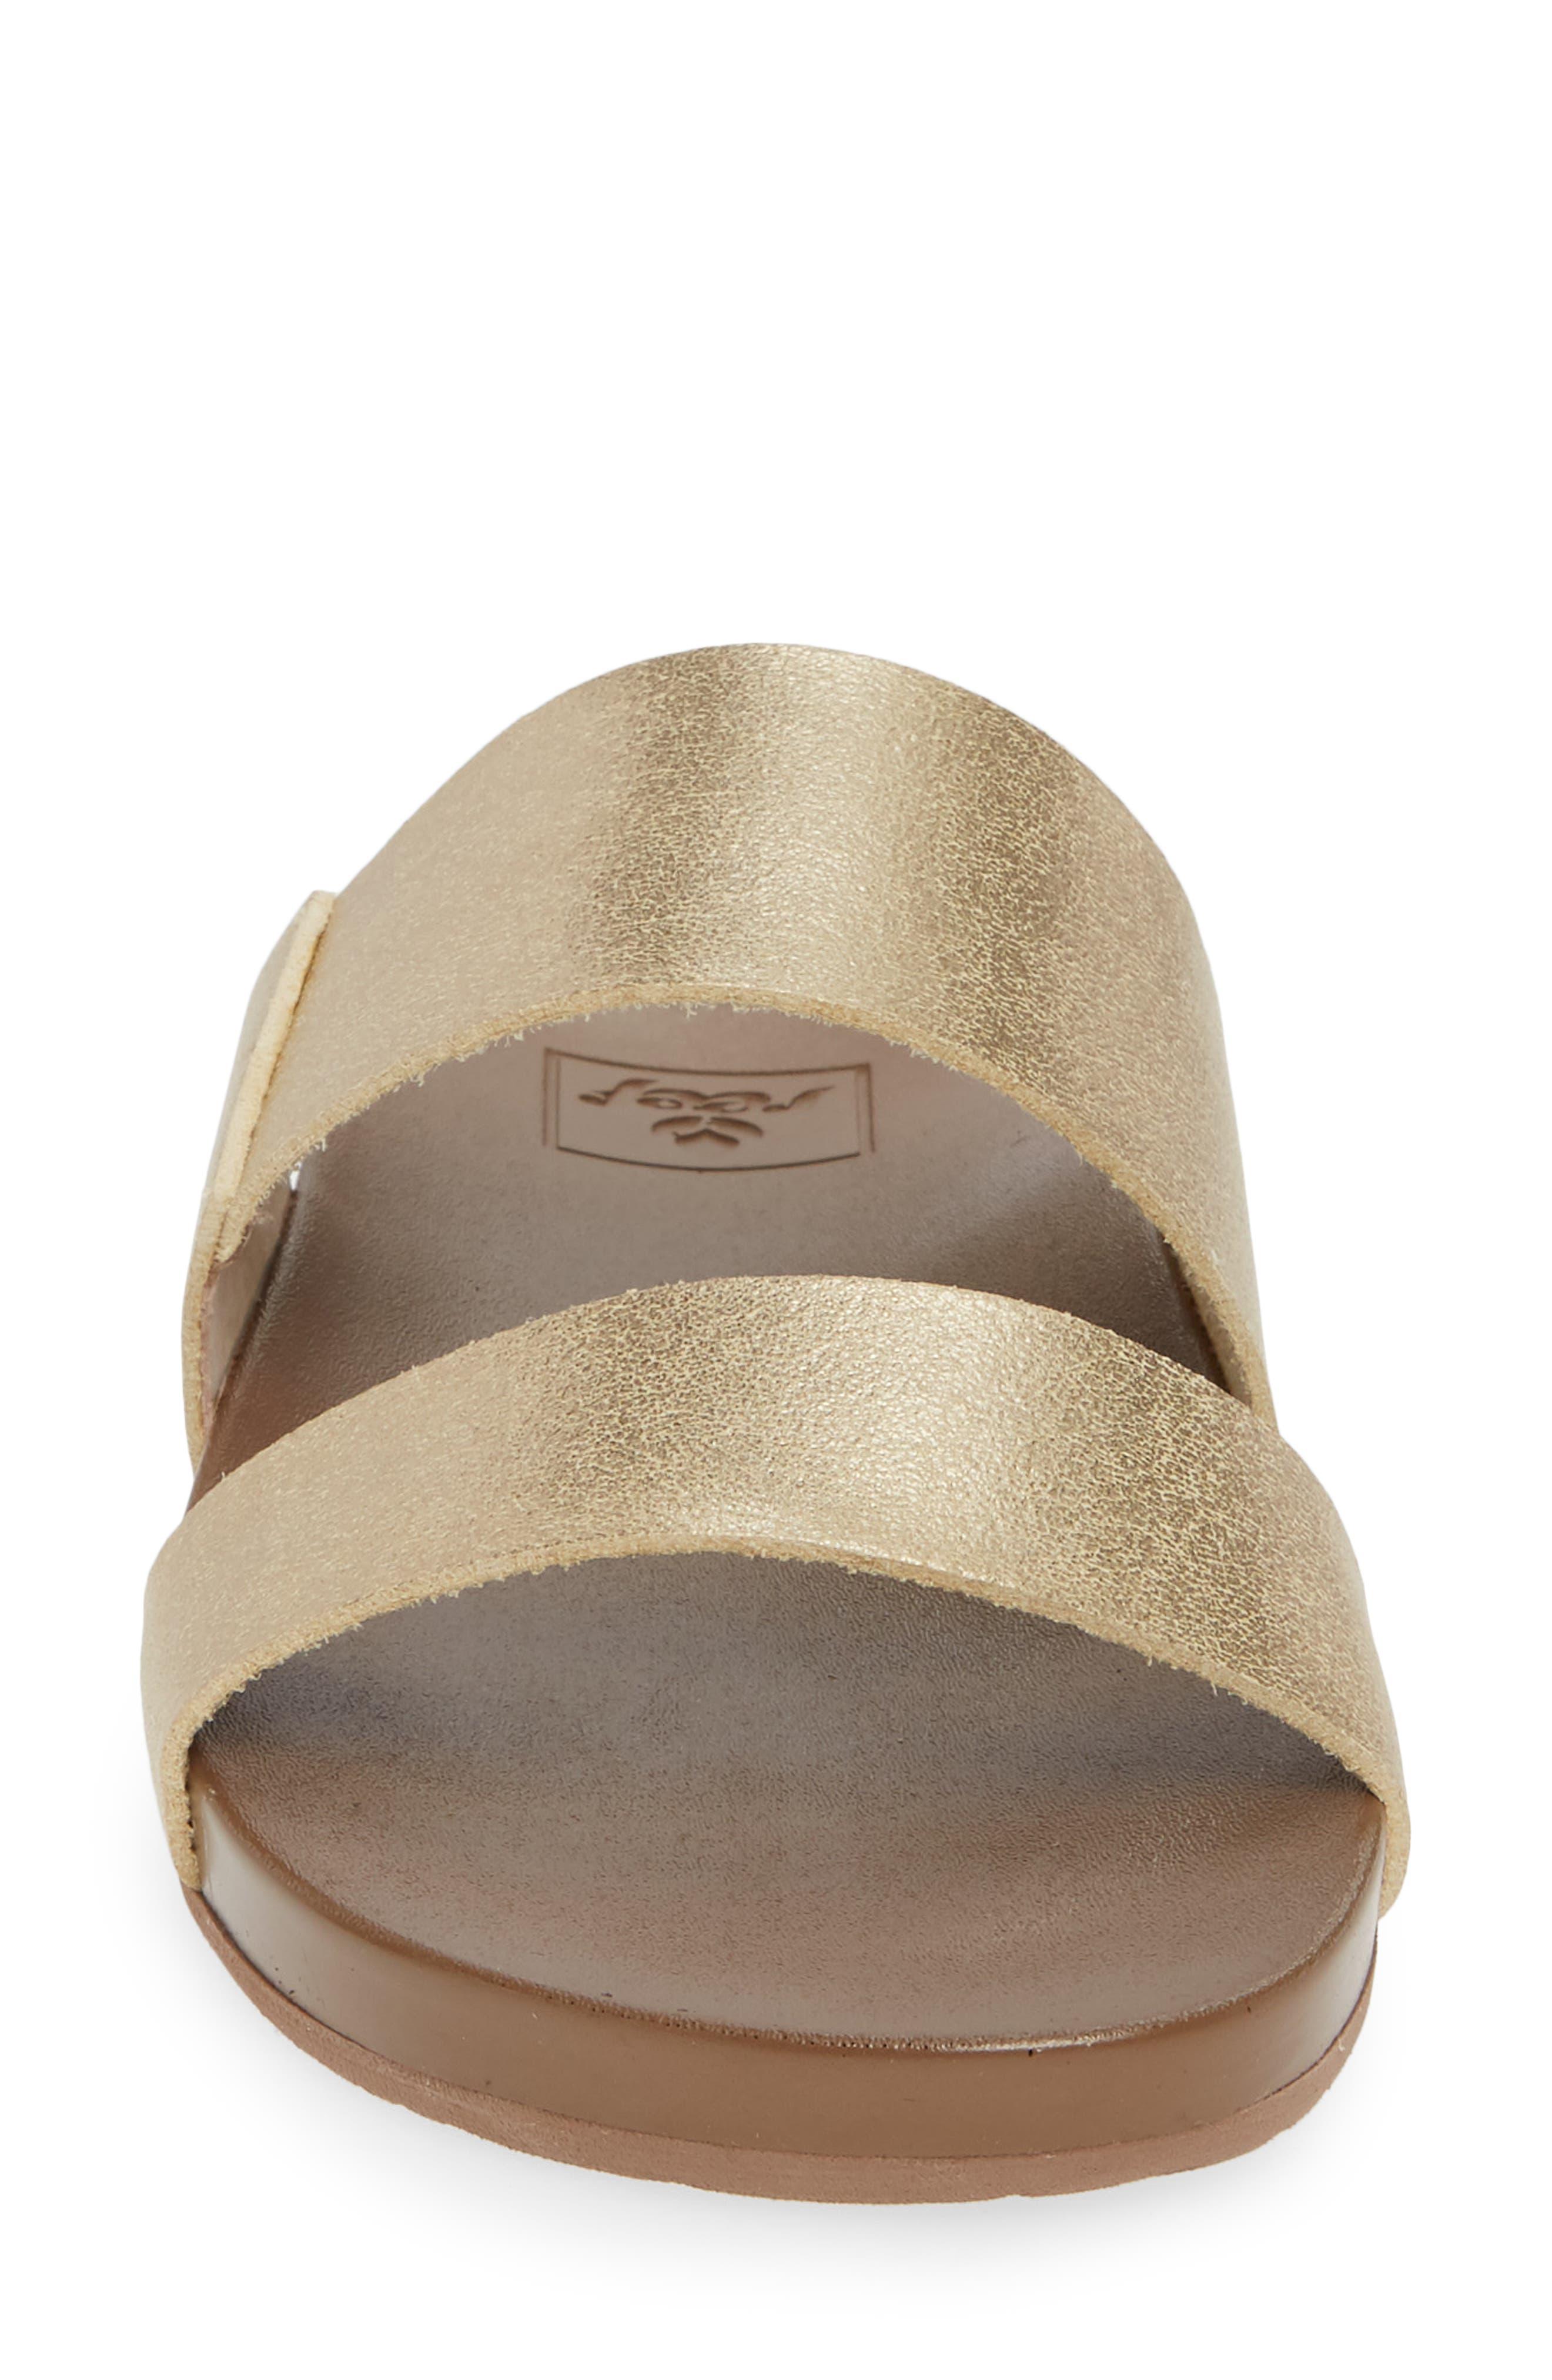 Cushion Bounce Vista Slide Sandal,                             Alternate thumbnail 4, color,                             CHAMPAGNE